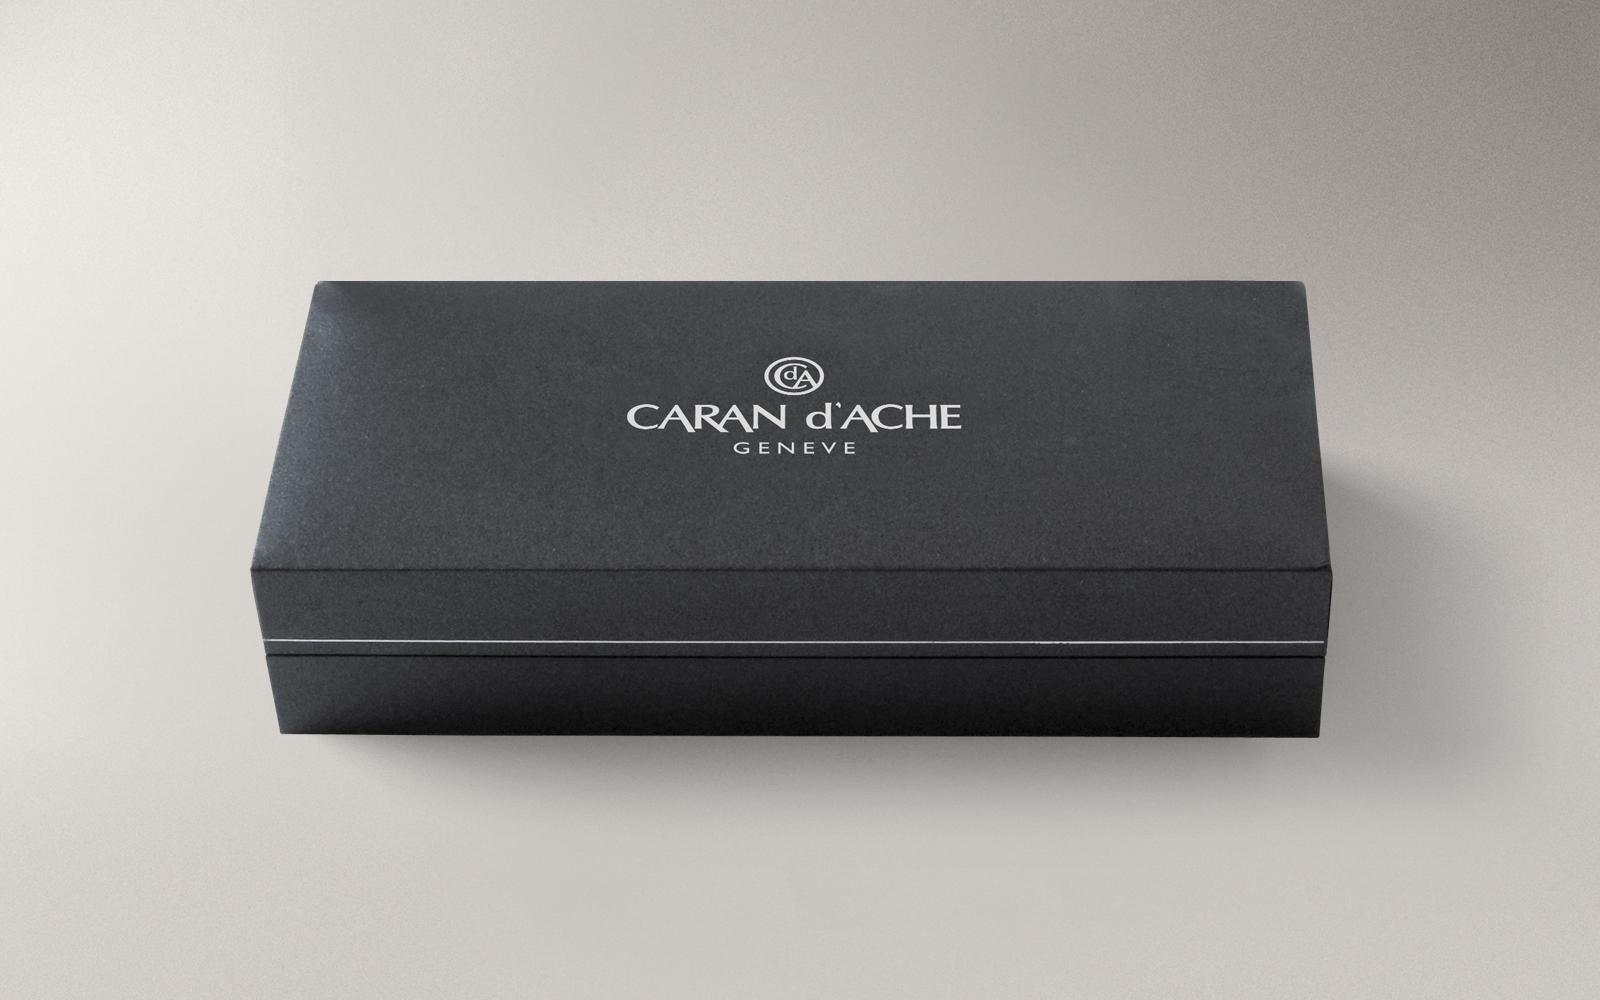 Carandache Ecridor - Yacht Club PC, ручка-роллер, F